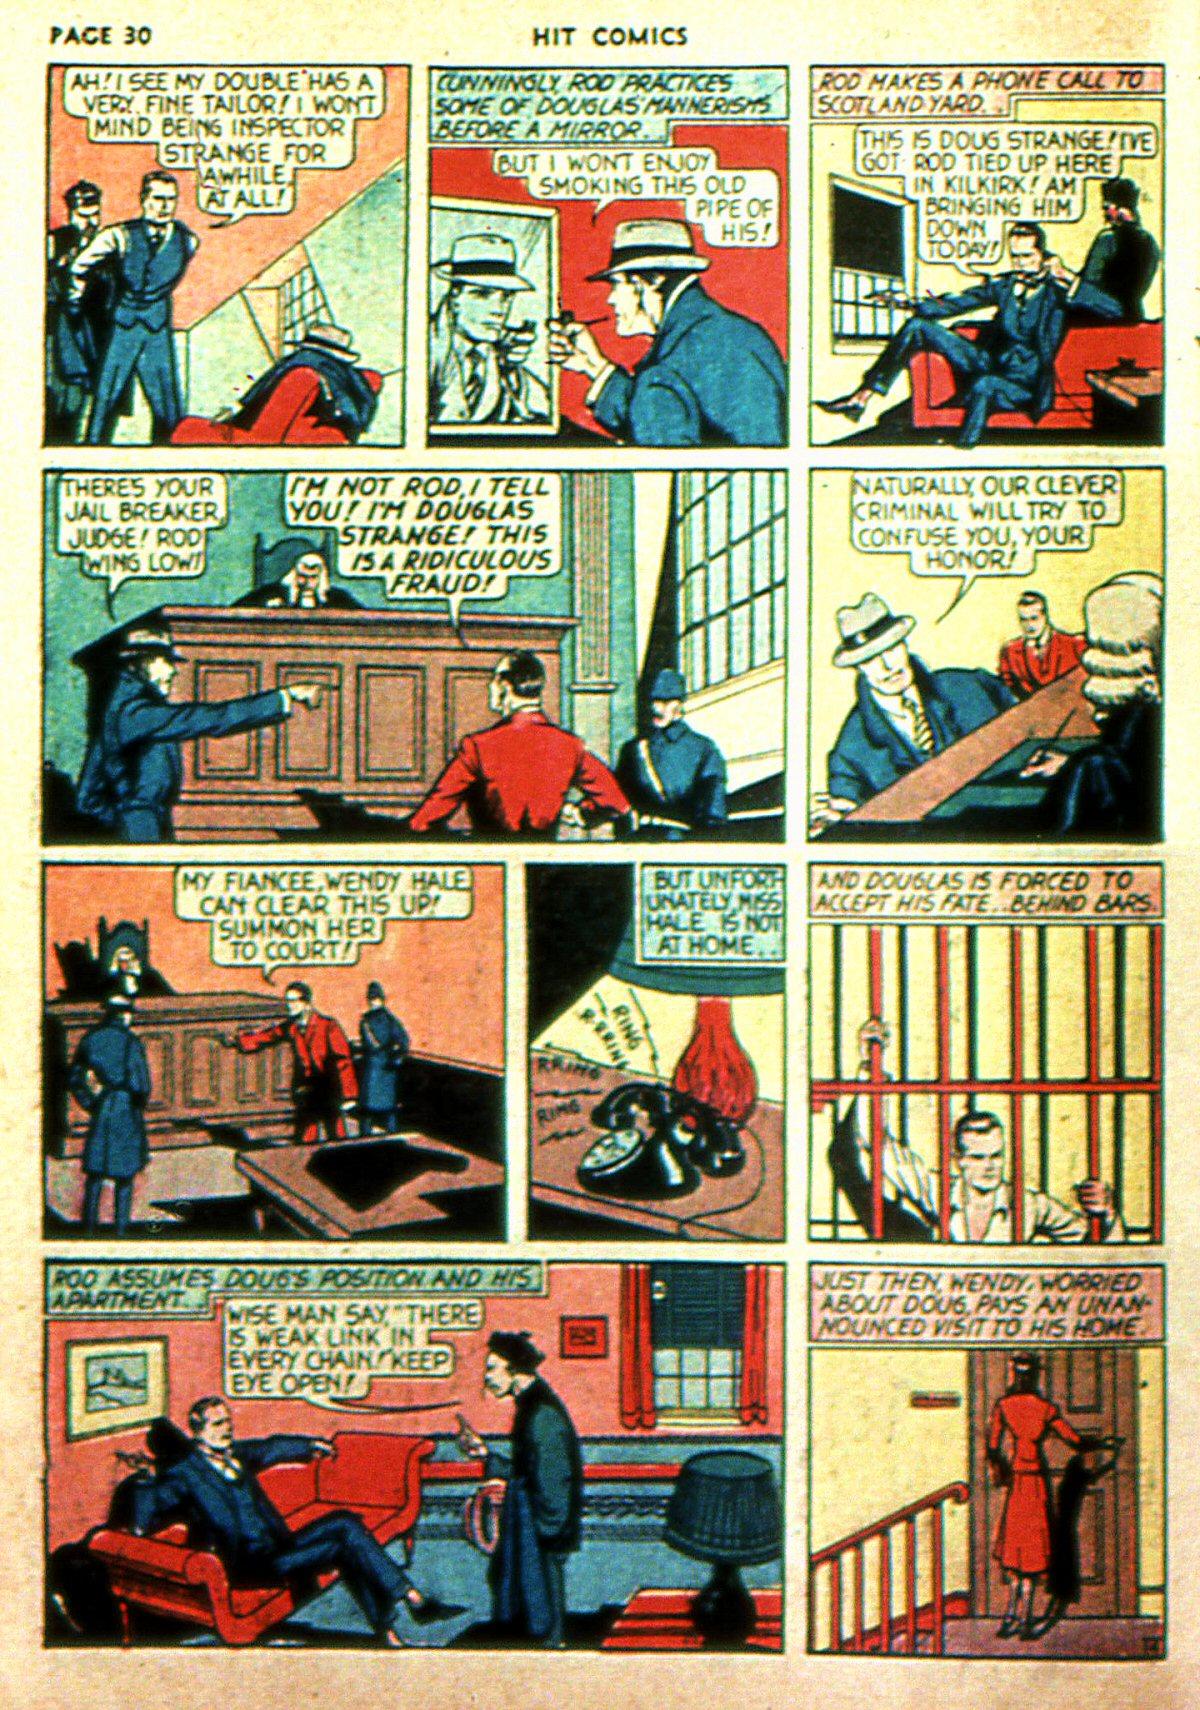 Read online Hit Comics comic -  Issue #2 - 32